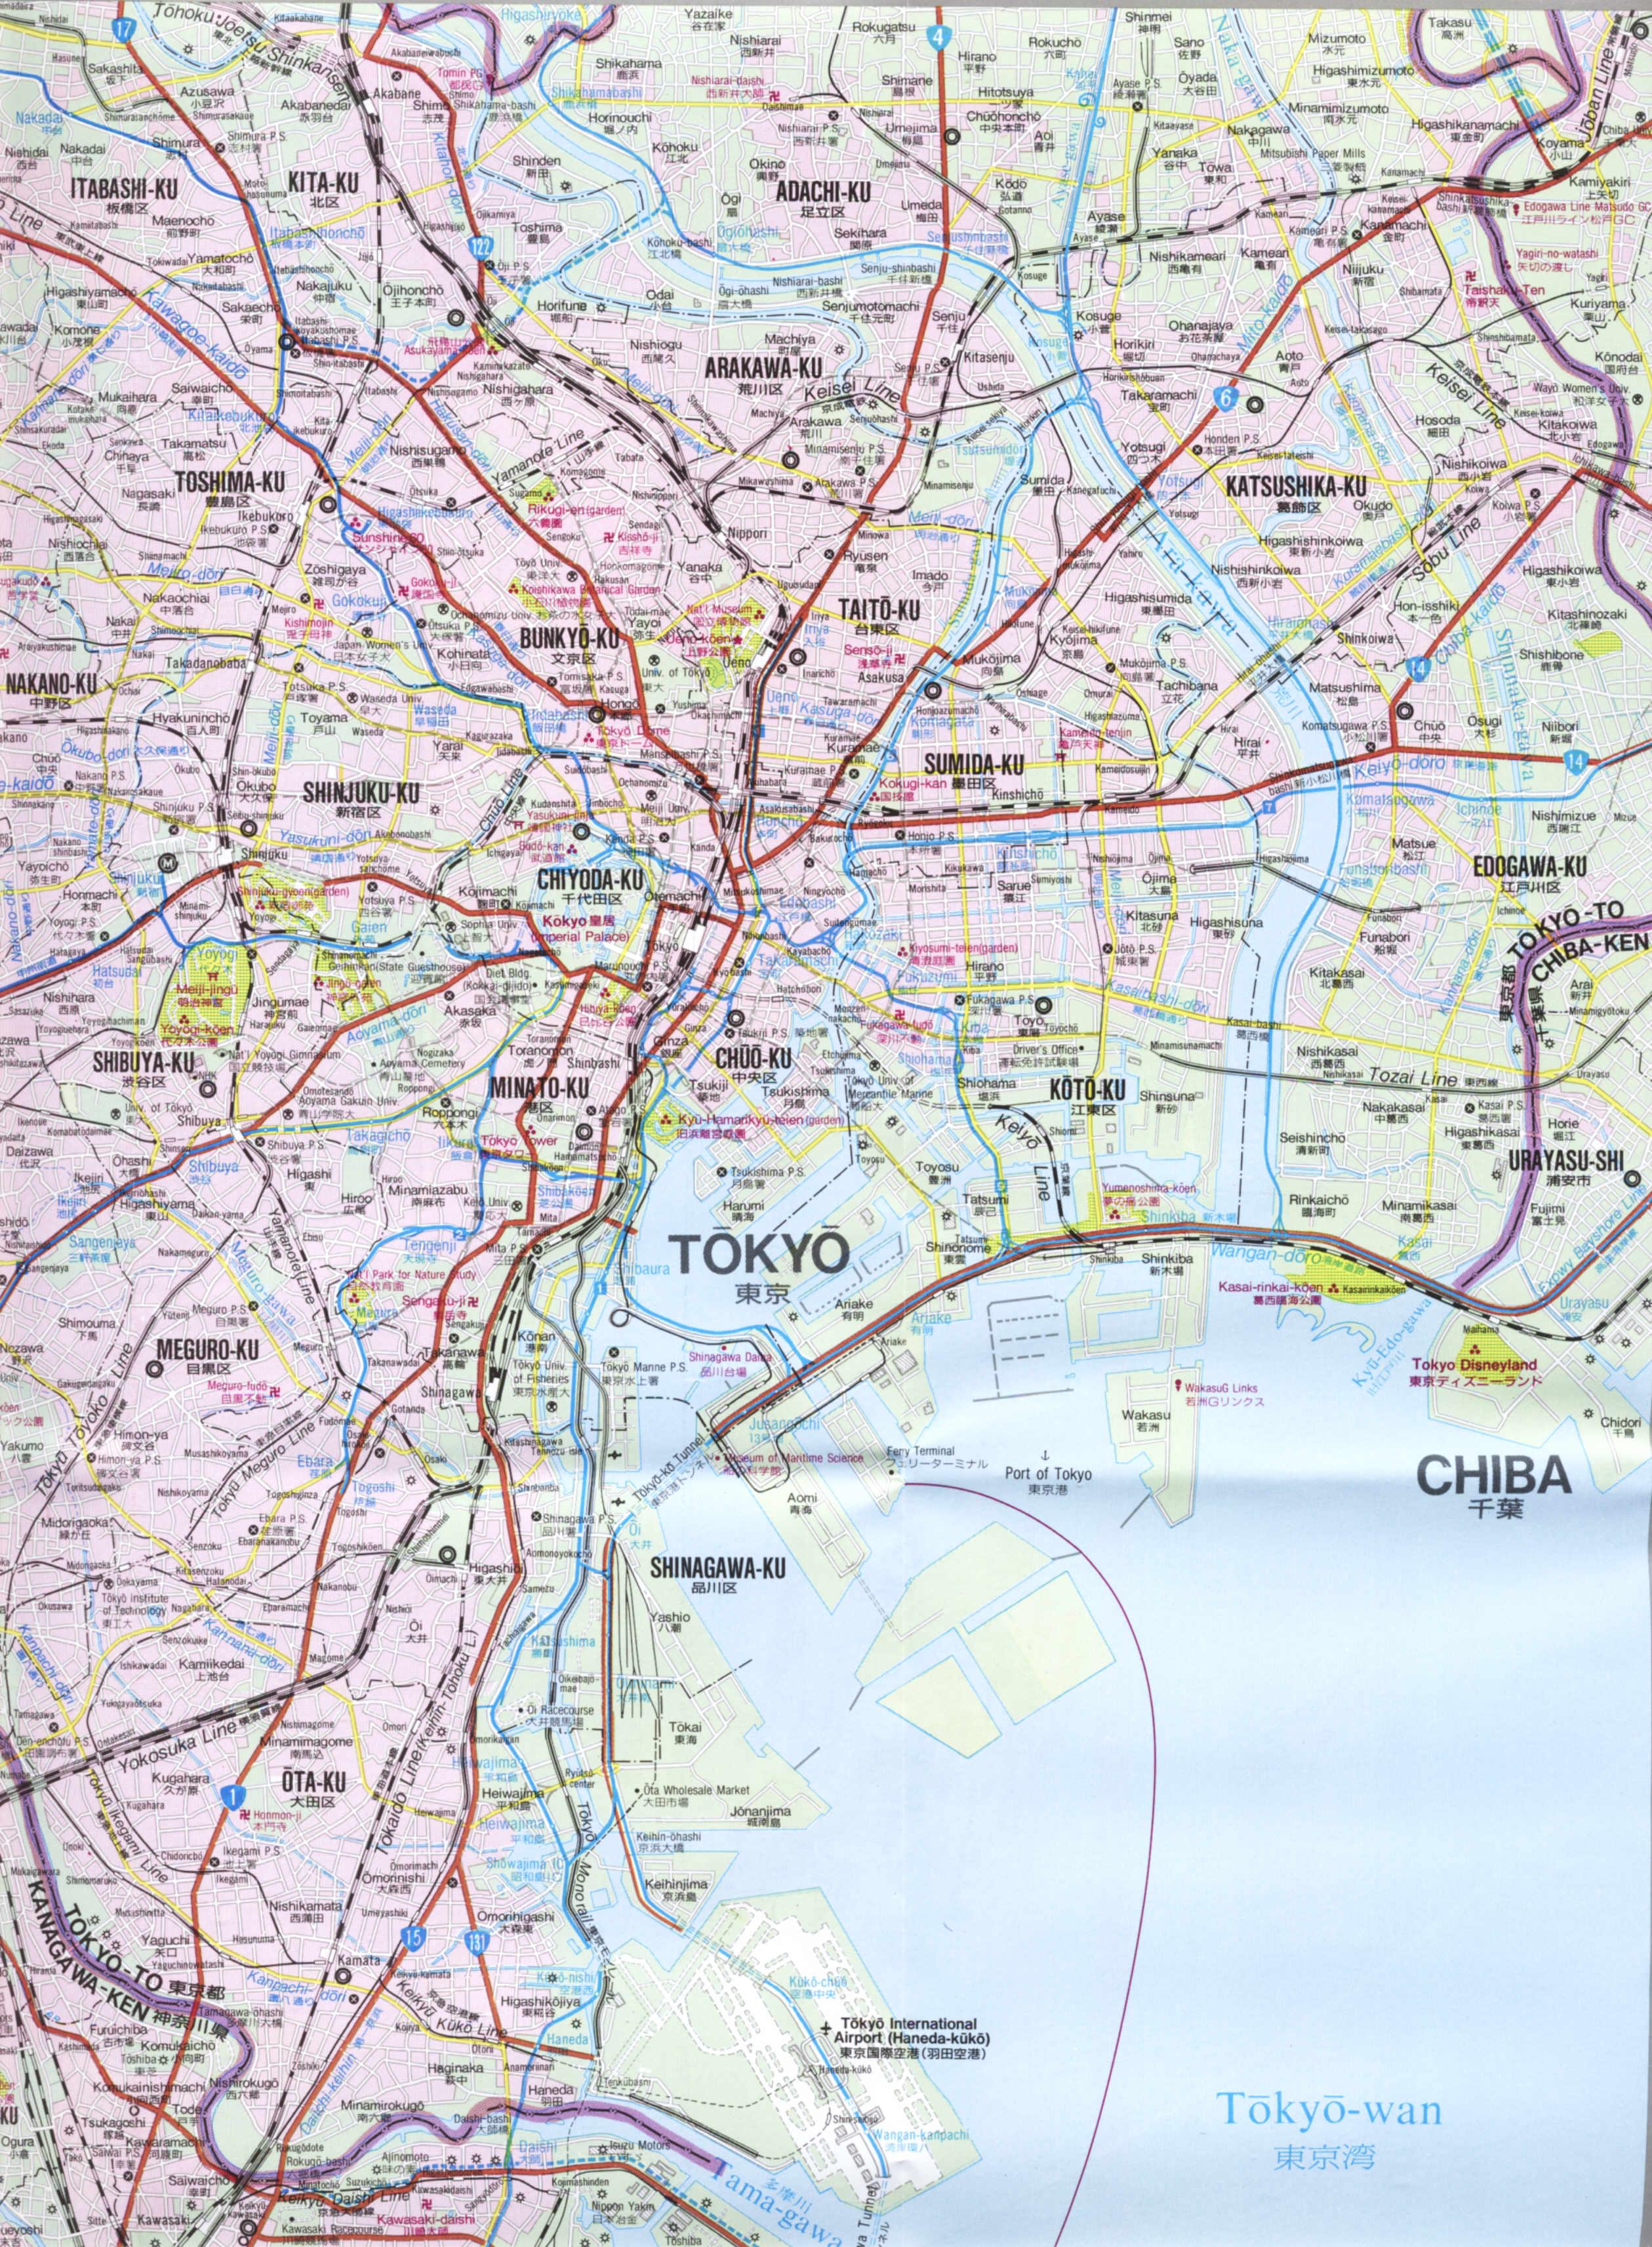 Tokyo Map Tokyo mappery